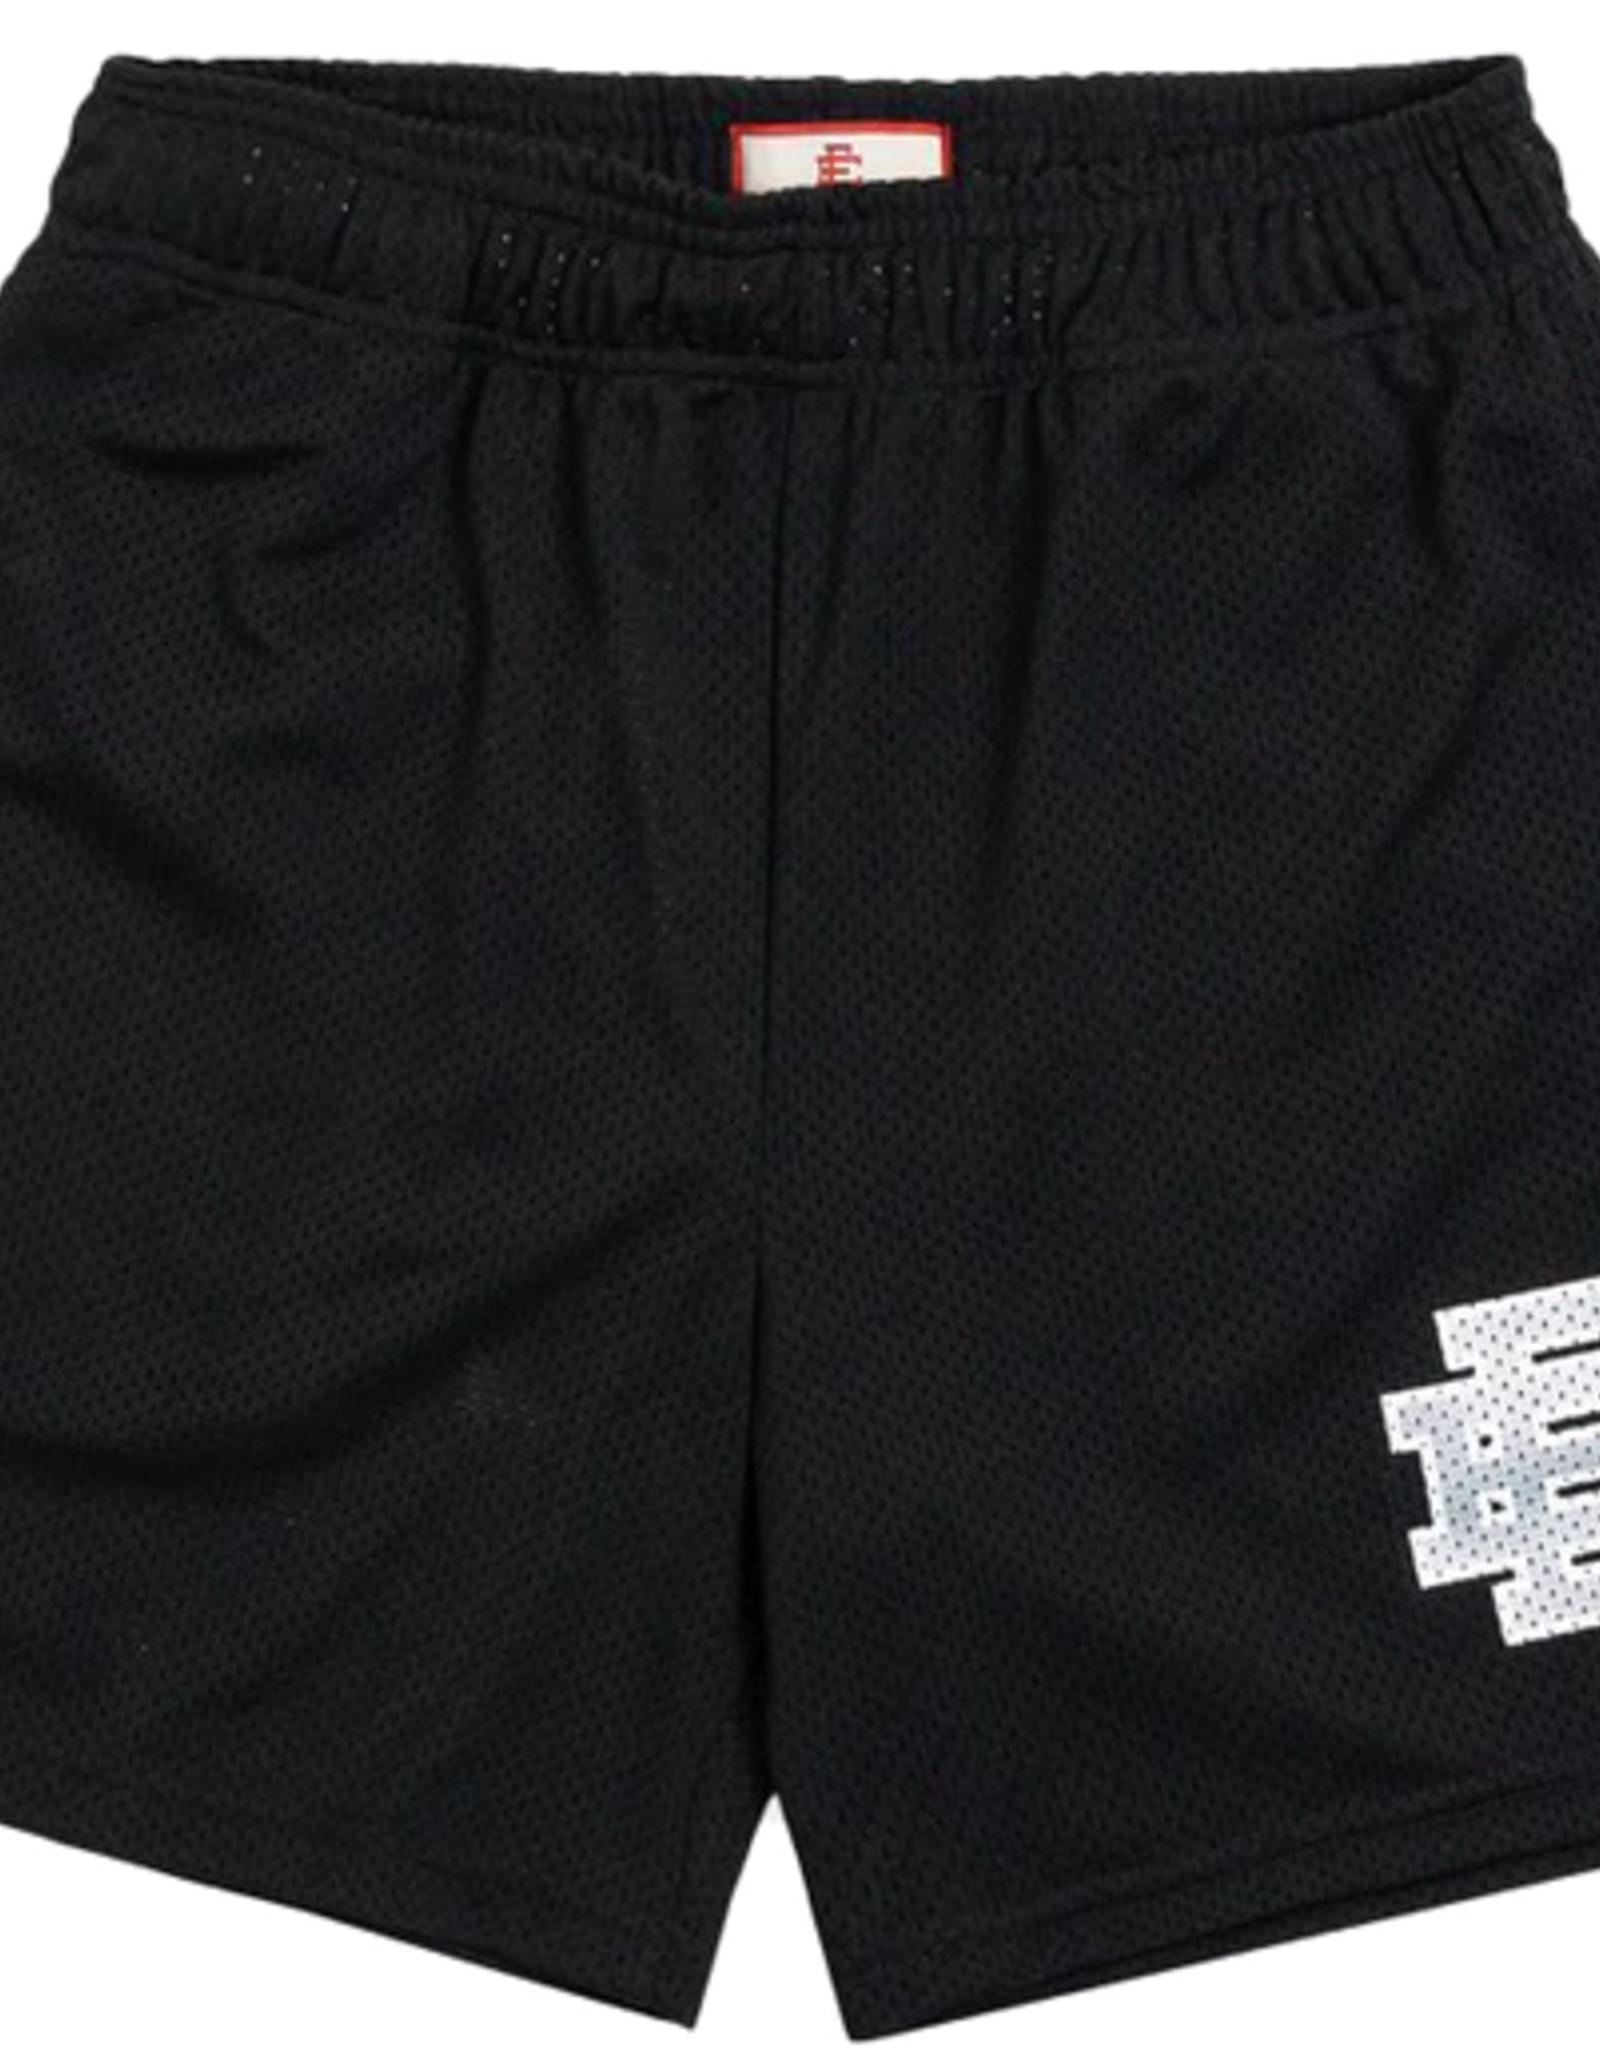 ERIC EMANUEL Eric Emanuel EE Basic Short Black/White/Silver Metallic